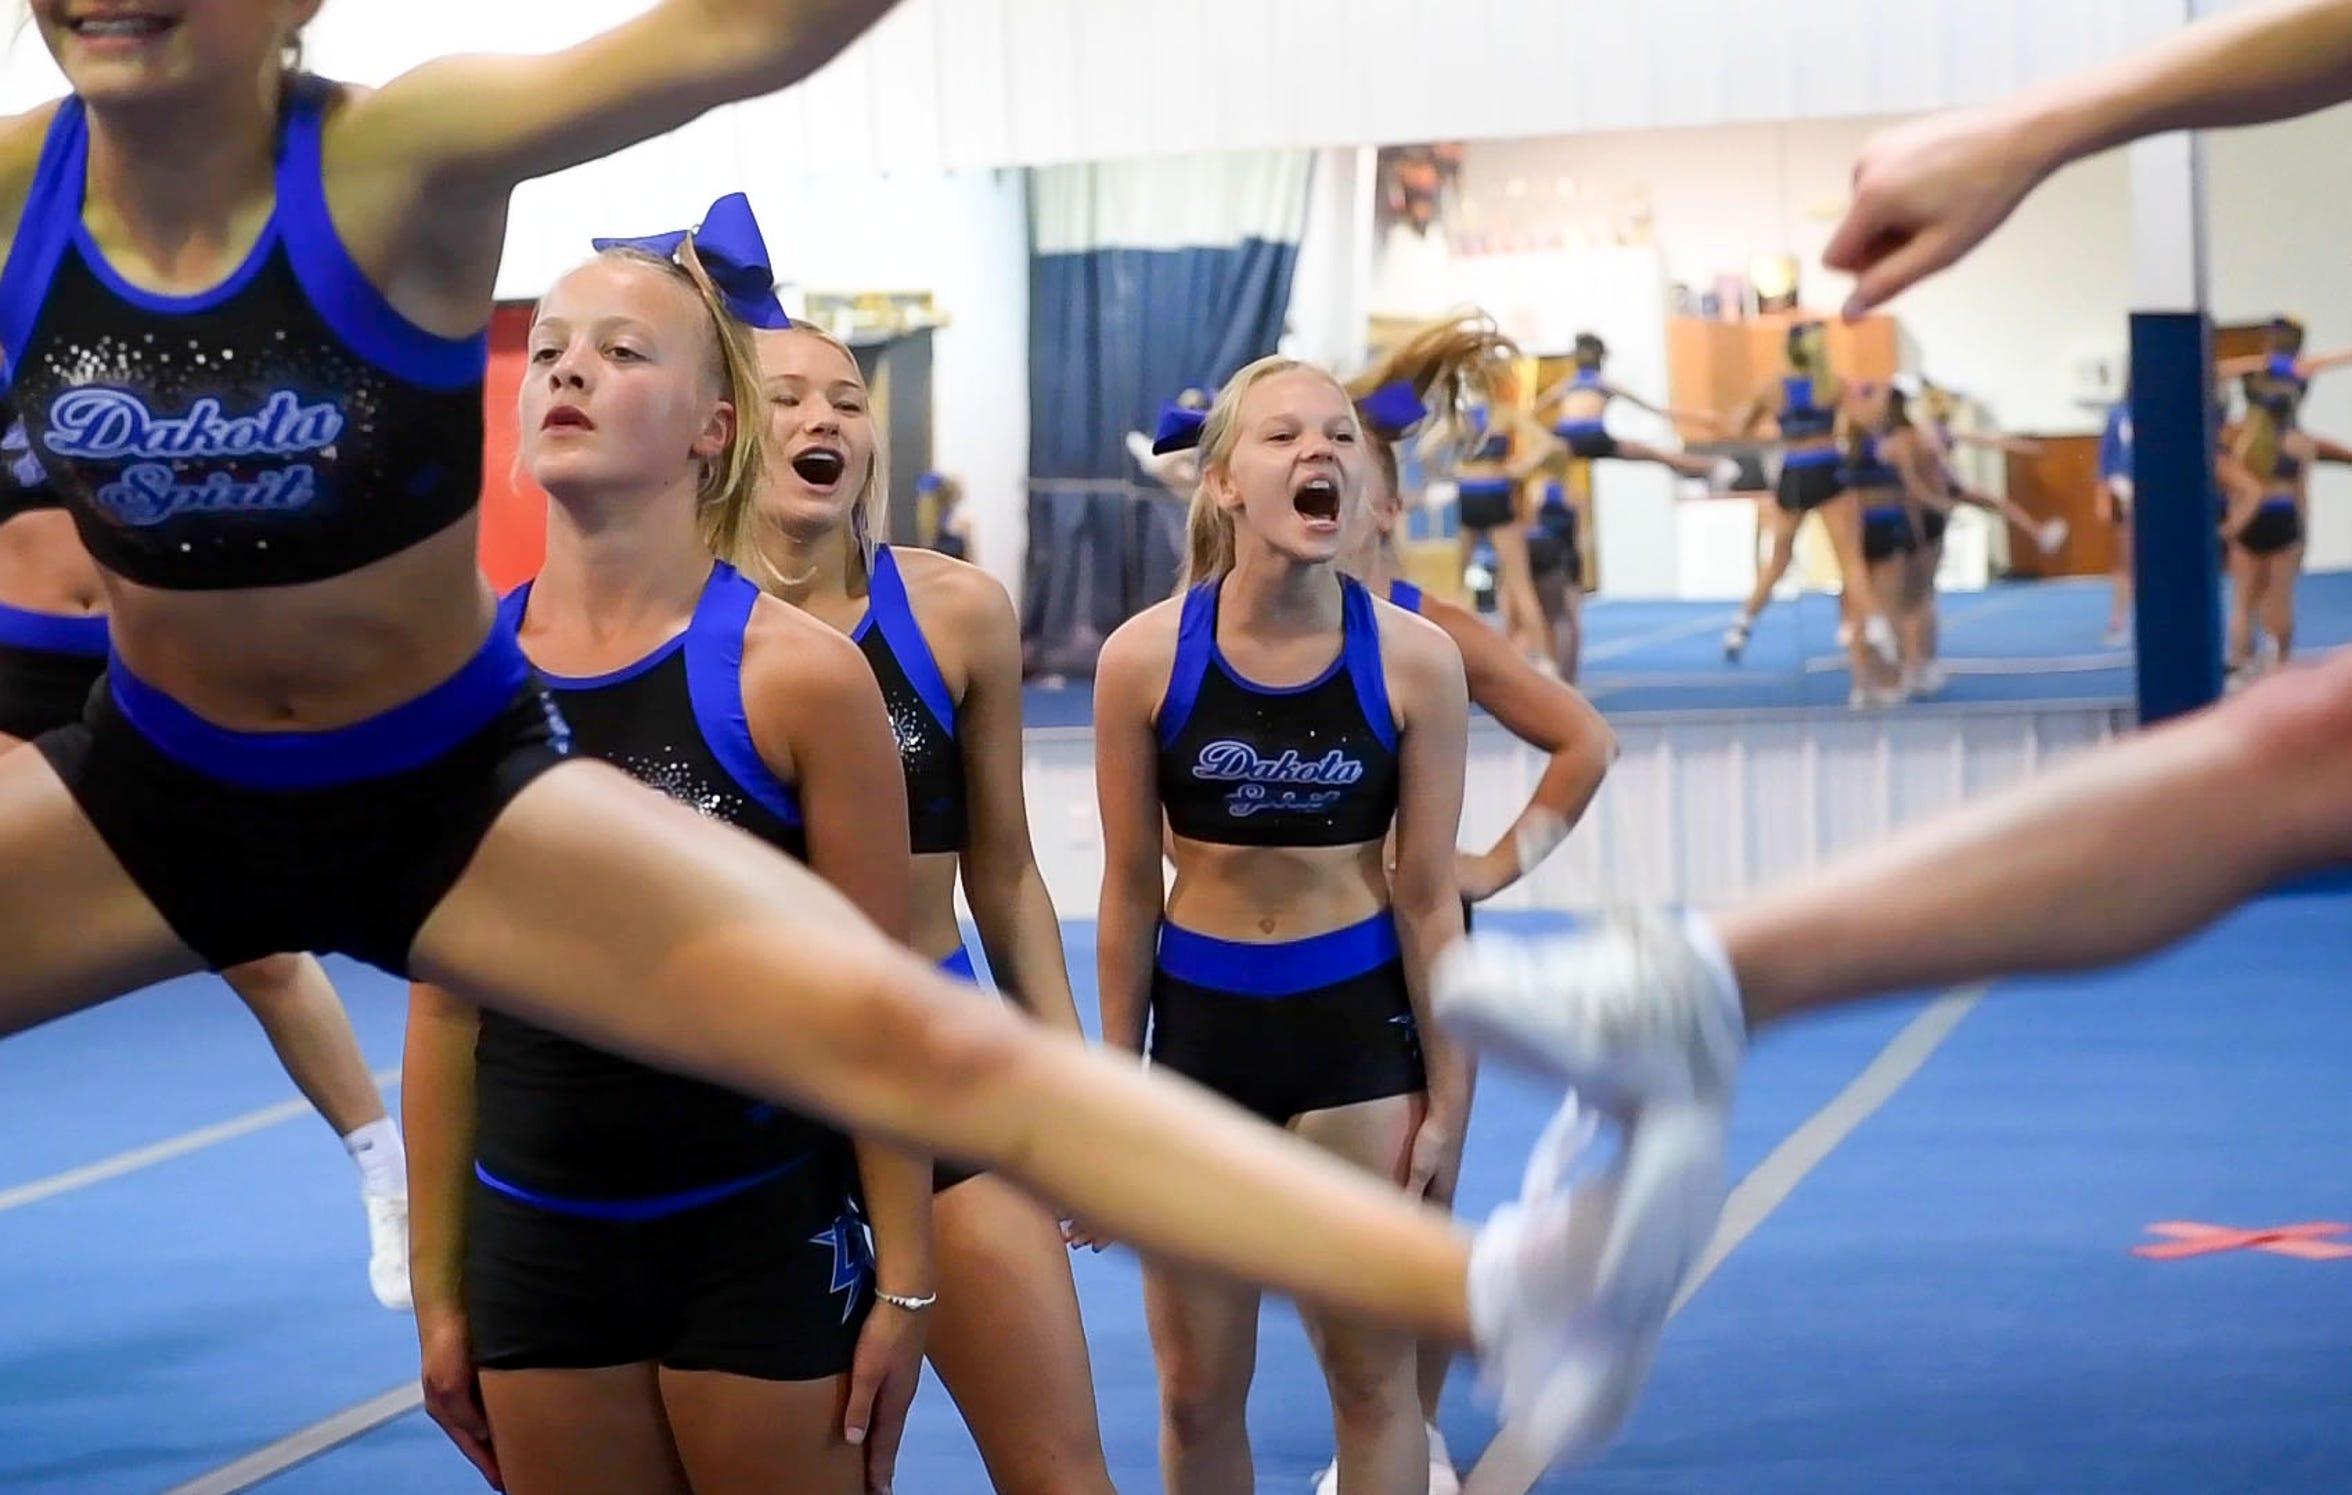 Dakota Spirit cheerleaders encourage their squad members during drills Thursday, June 27, in Sioux Falls.